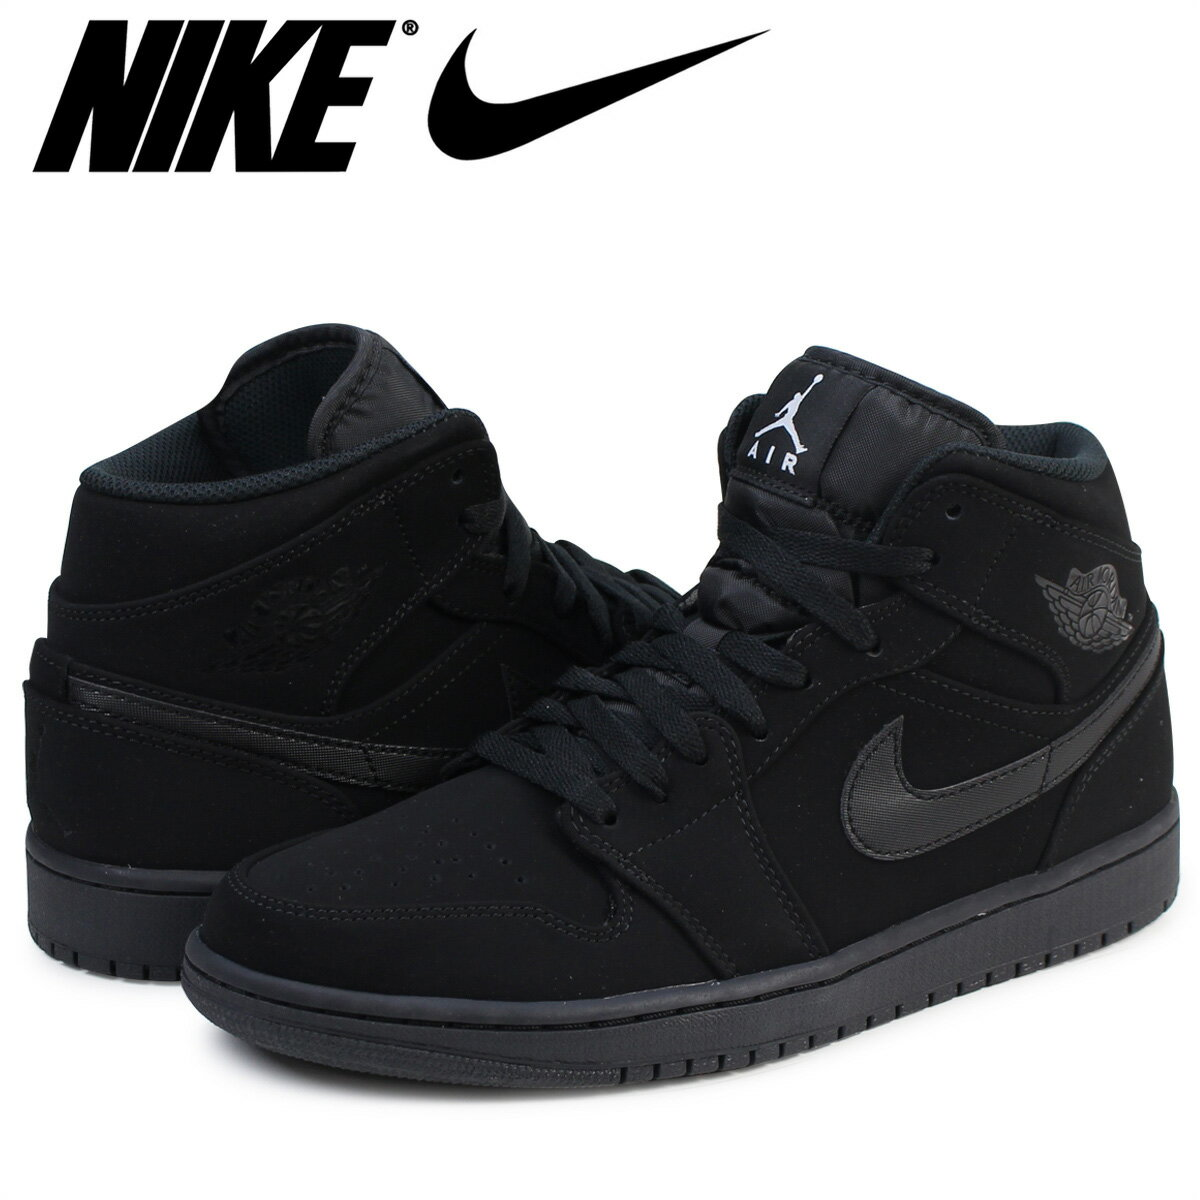 NIKE AIR JORDAN 1 MID ナイキ エアジョーダン1 スニーカー メンズ 554724-040 靴 ブラック [12/1 追加入荷]